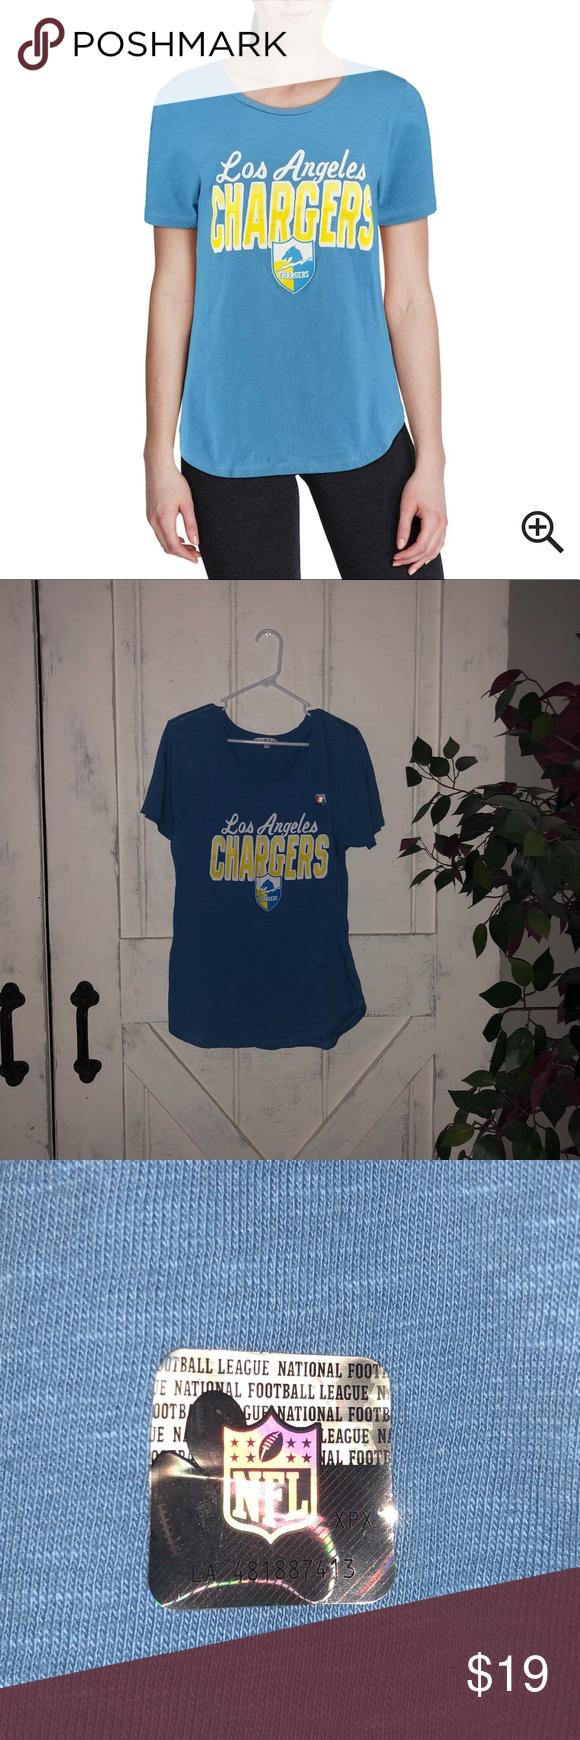 LA Chargers Junk Food TShirt🌟 Junk food t shirts, T